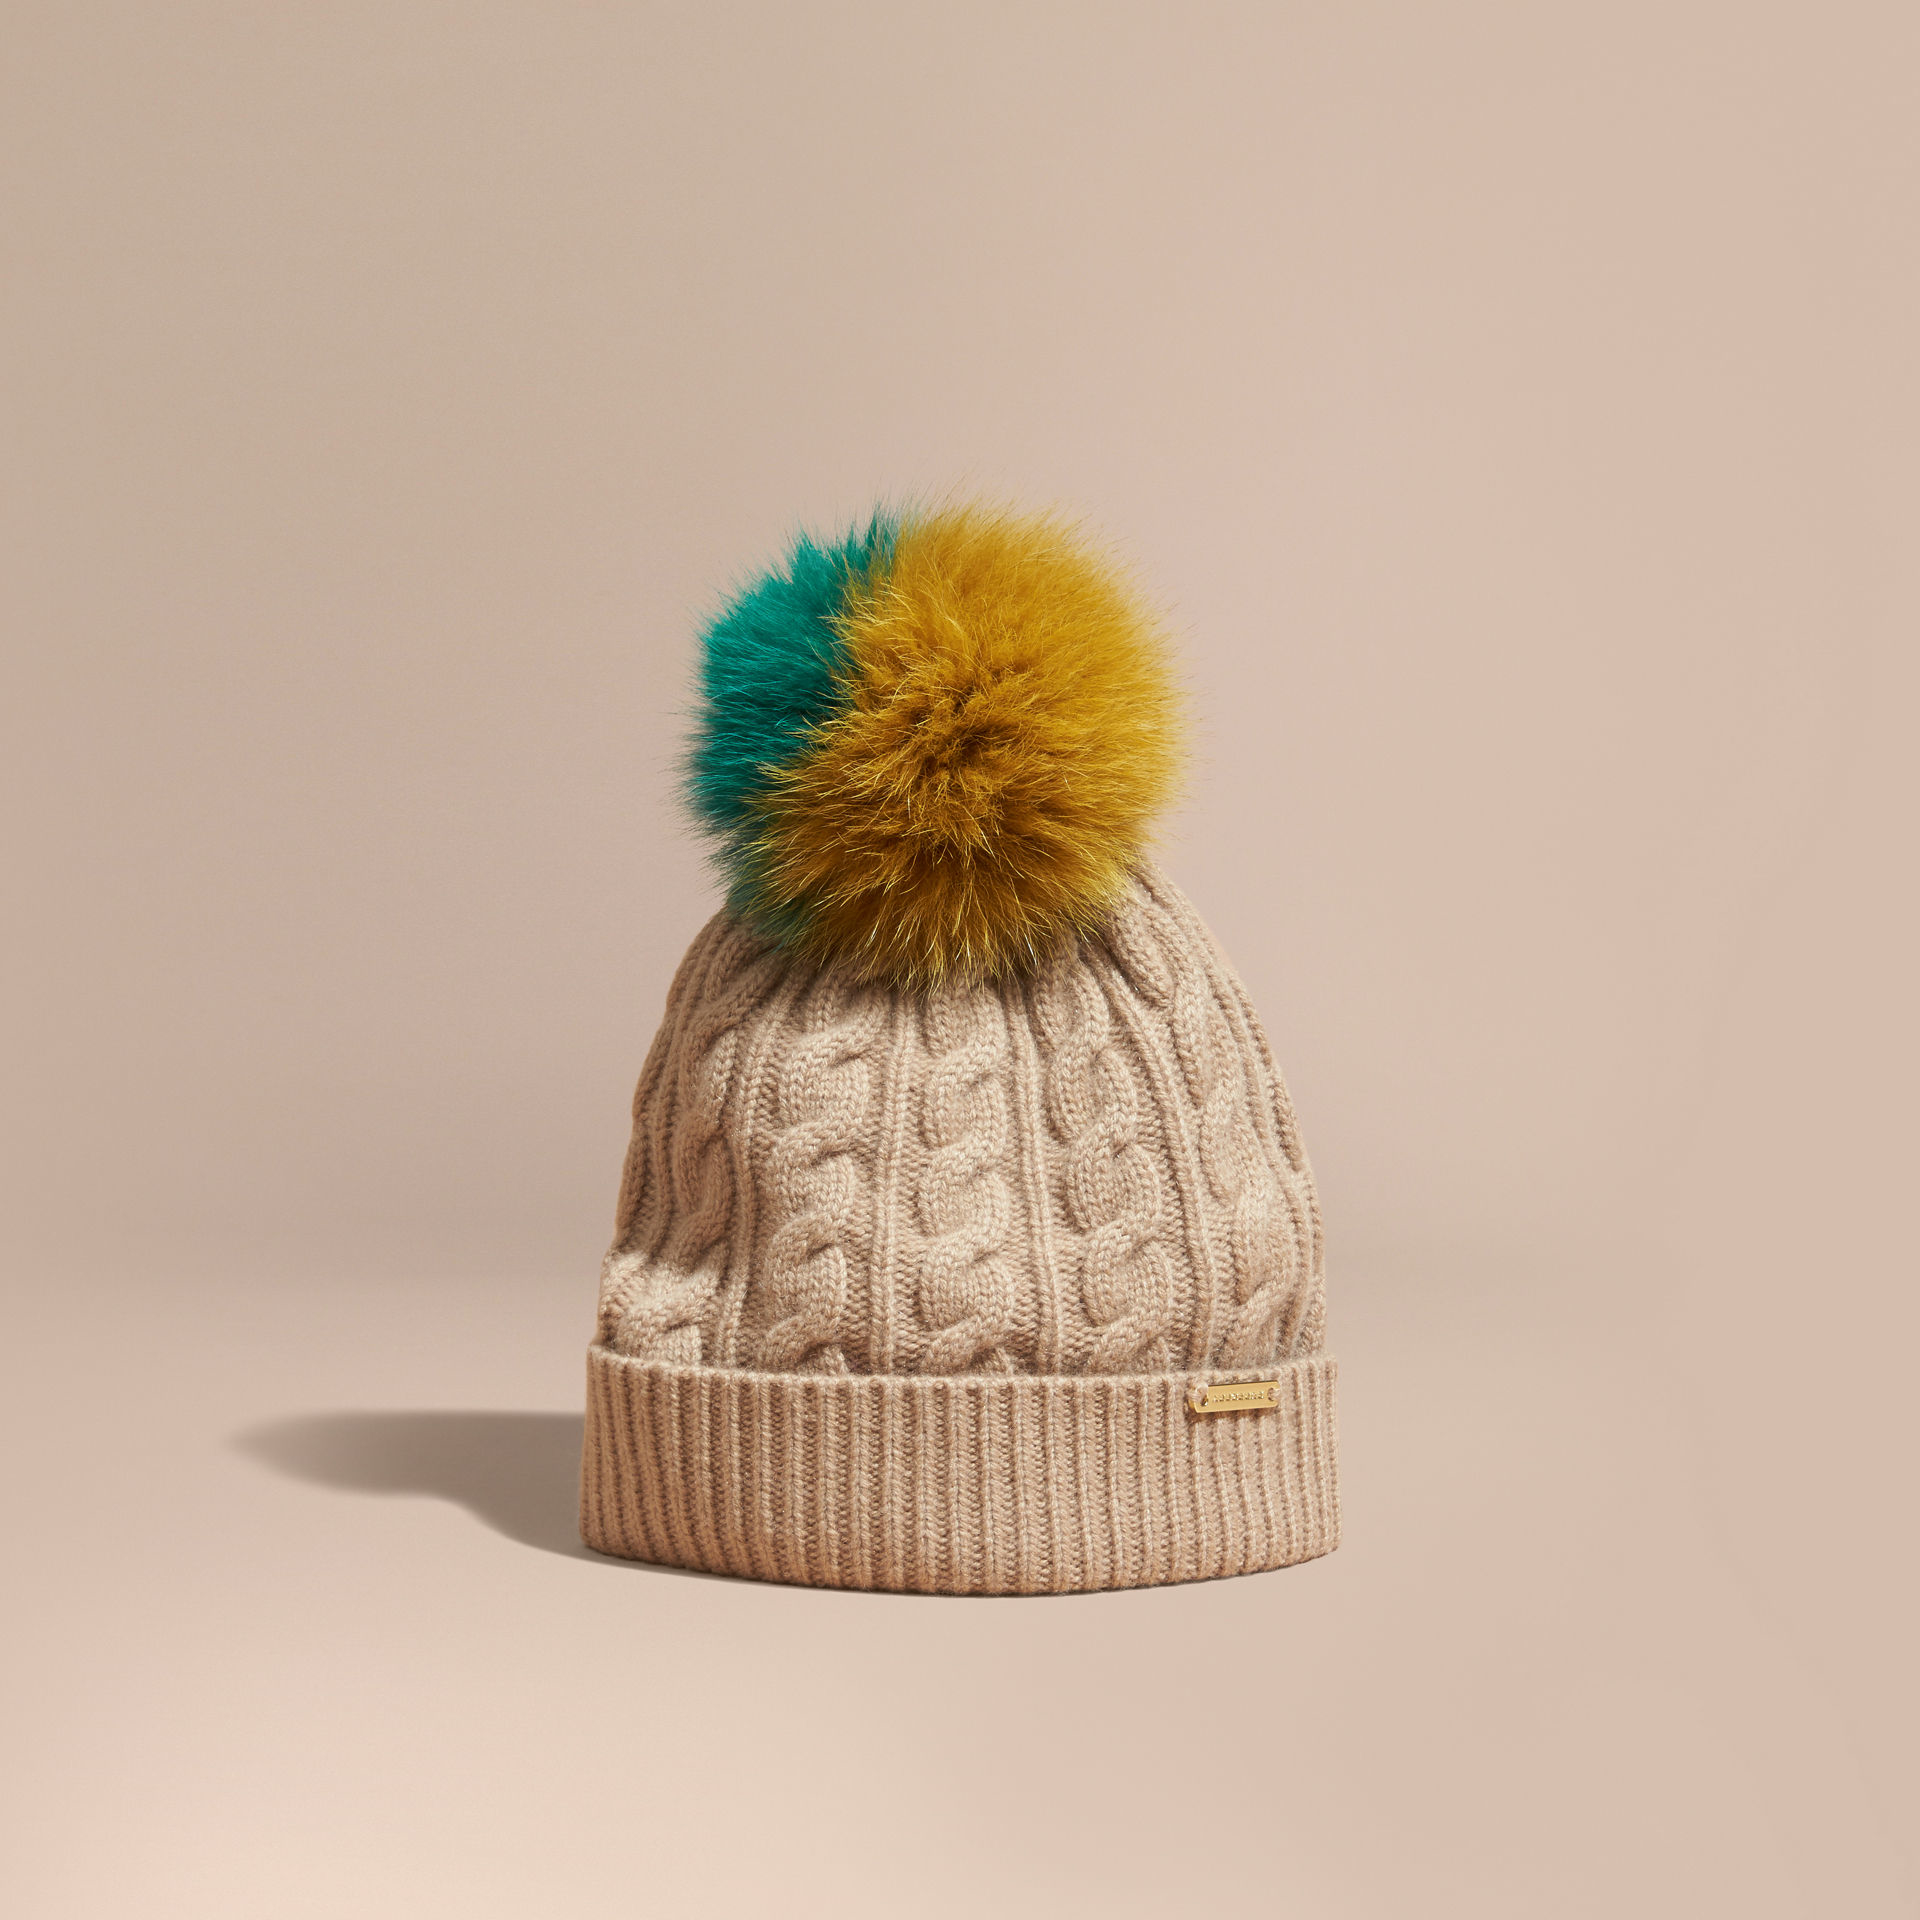 8a52cb0ea Burberry Multicolor Wool Cashmere Beanie With Fur Pom-pom Camel